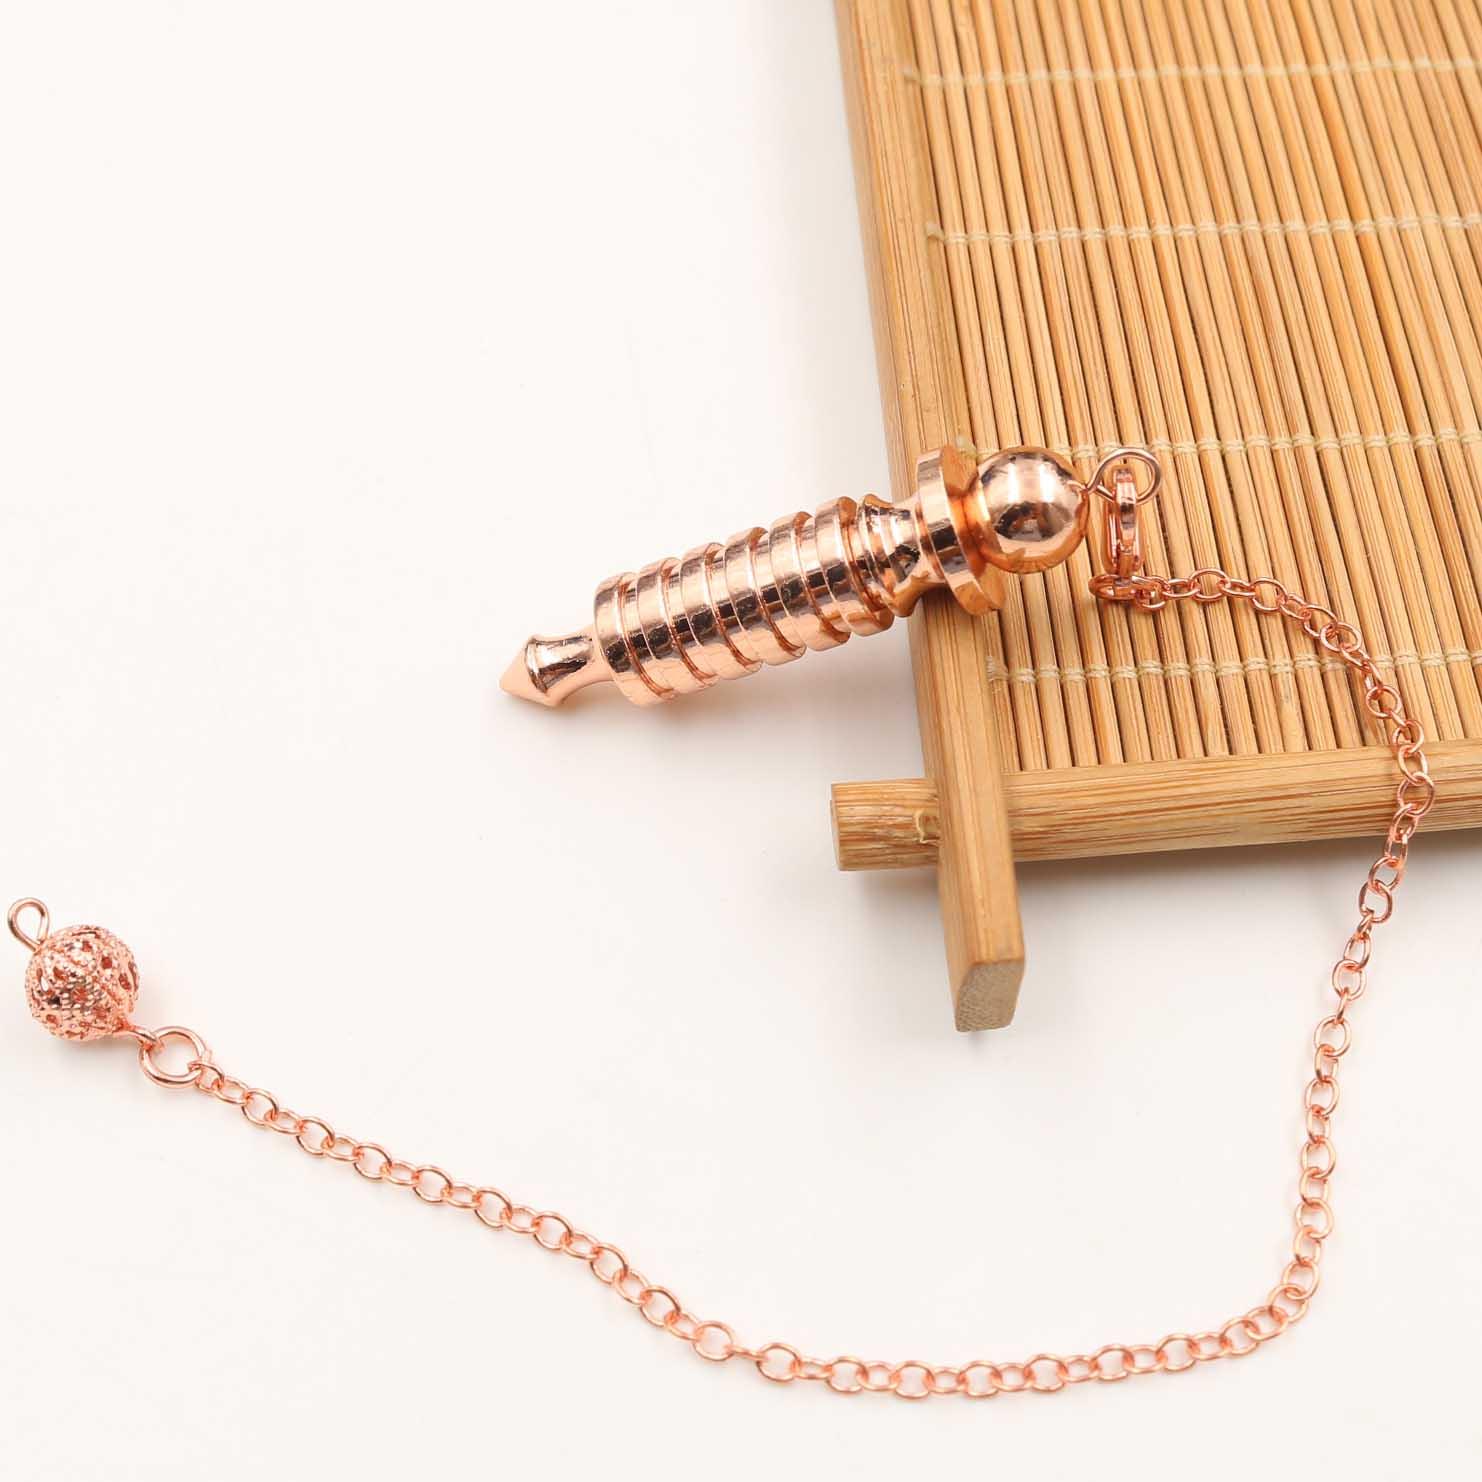 Metal Amulet Spiral Cone Copper Pendulum Dowsing Pyramid Pendule Reiki Jewelry